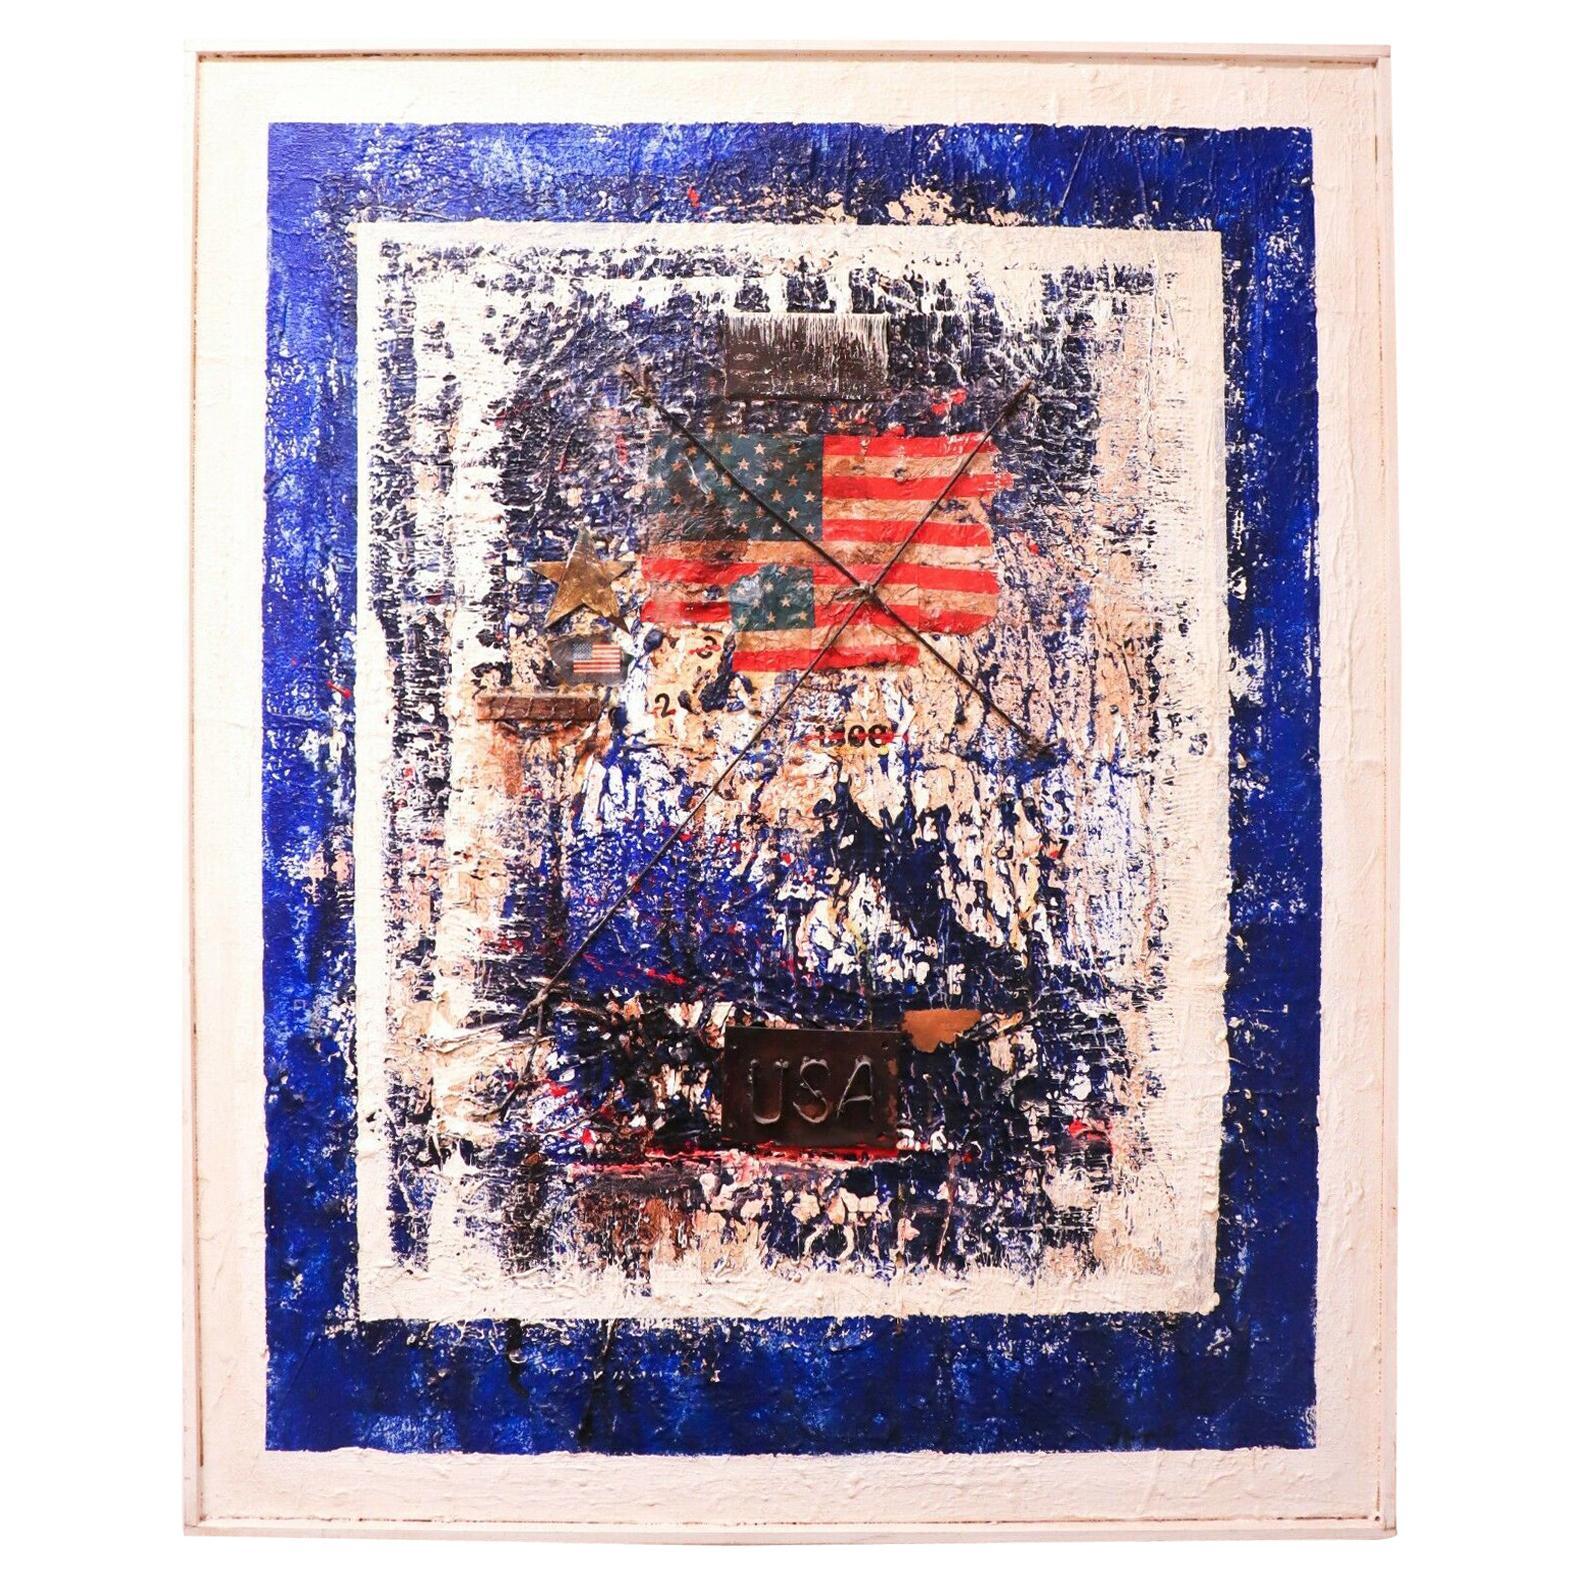 James Coignard, Oil Painting on Canvas / Collage, USA